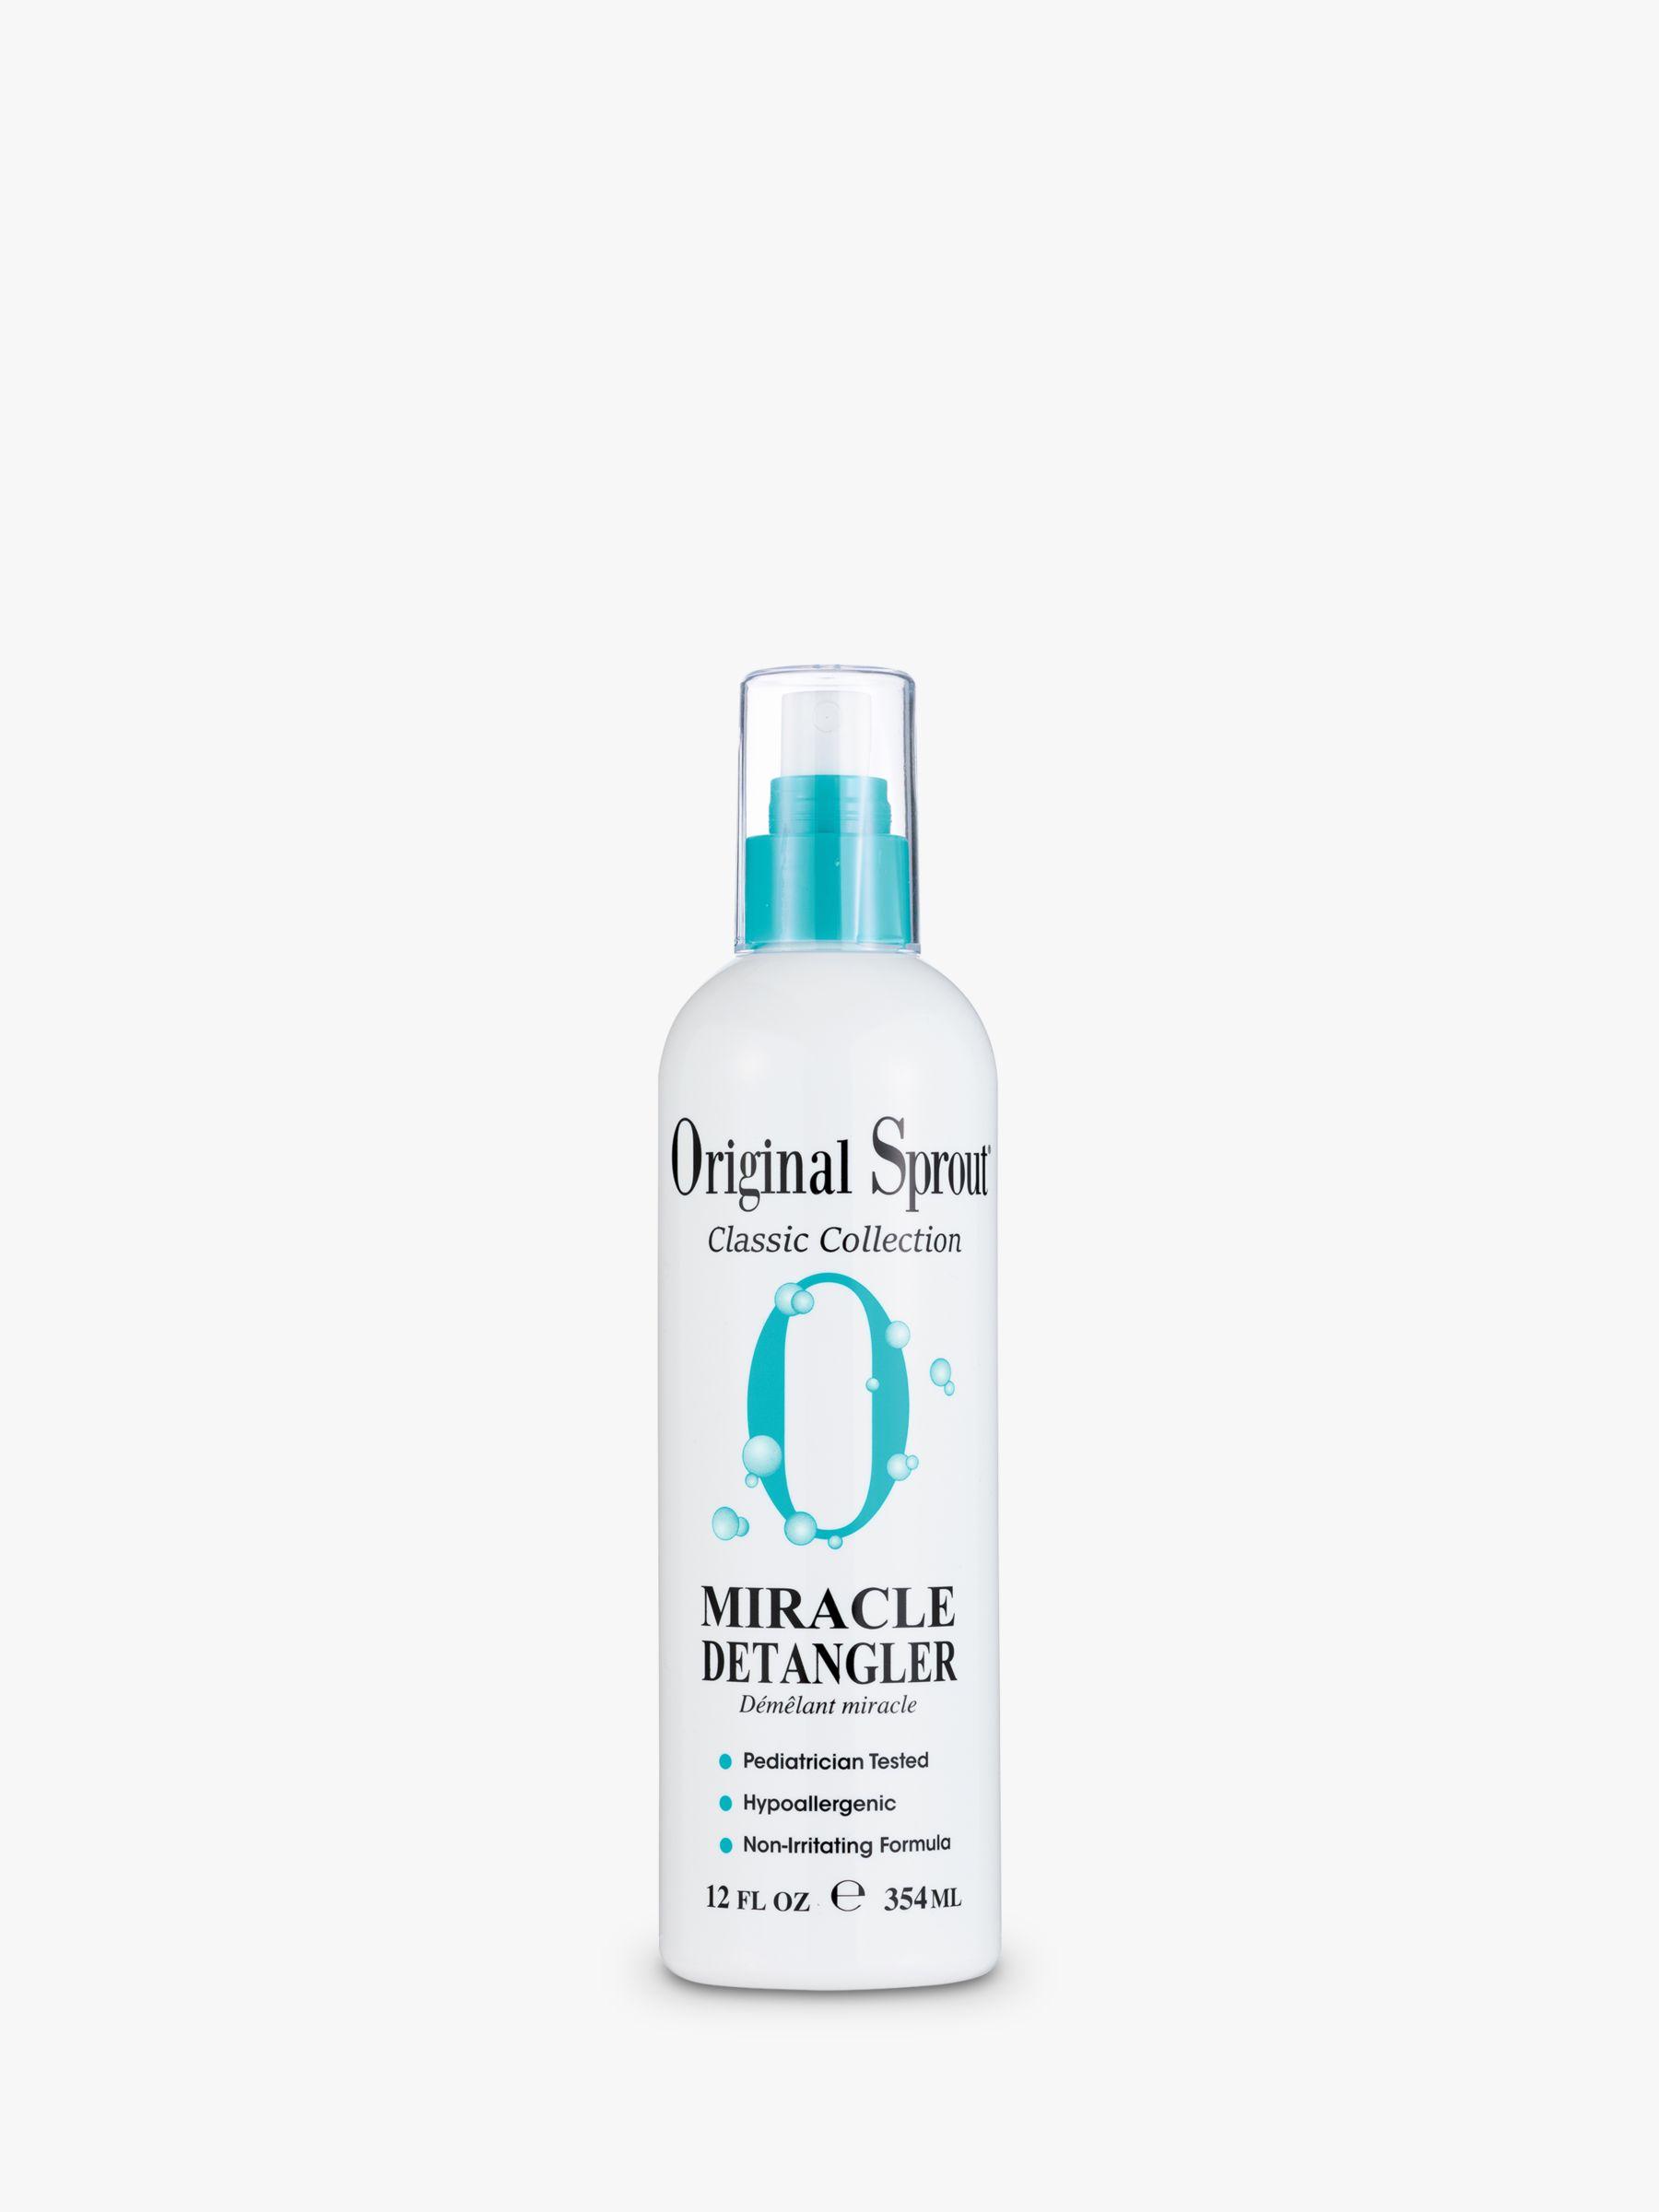 Original Sprout Original Sprout Miracle Baby Detangler Spray, 354ml